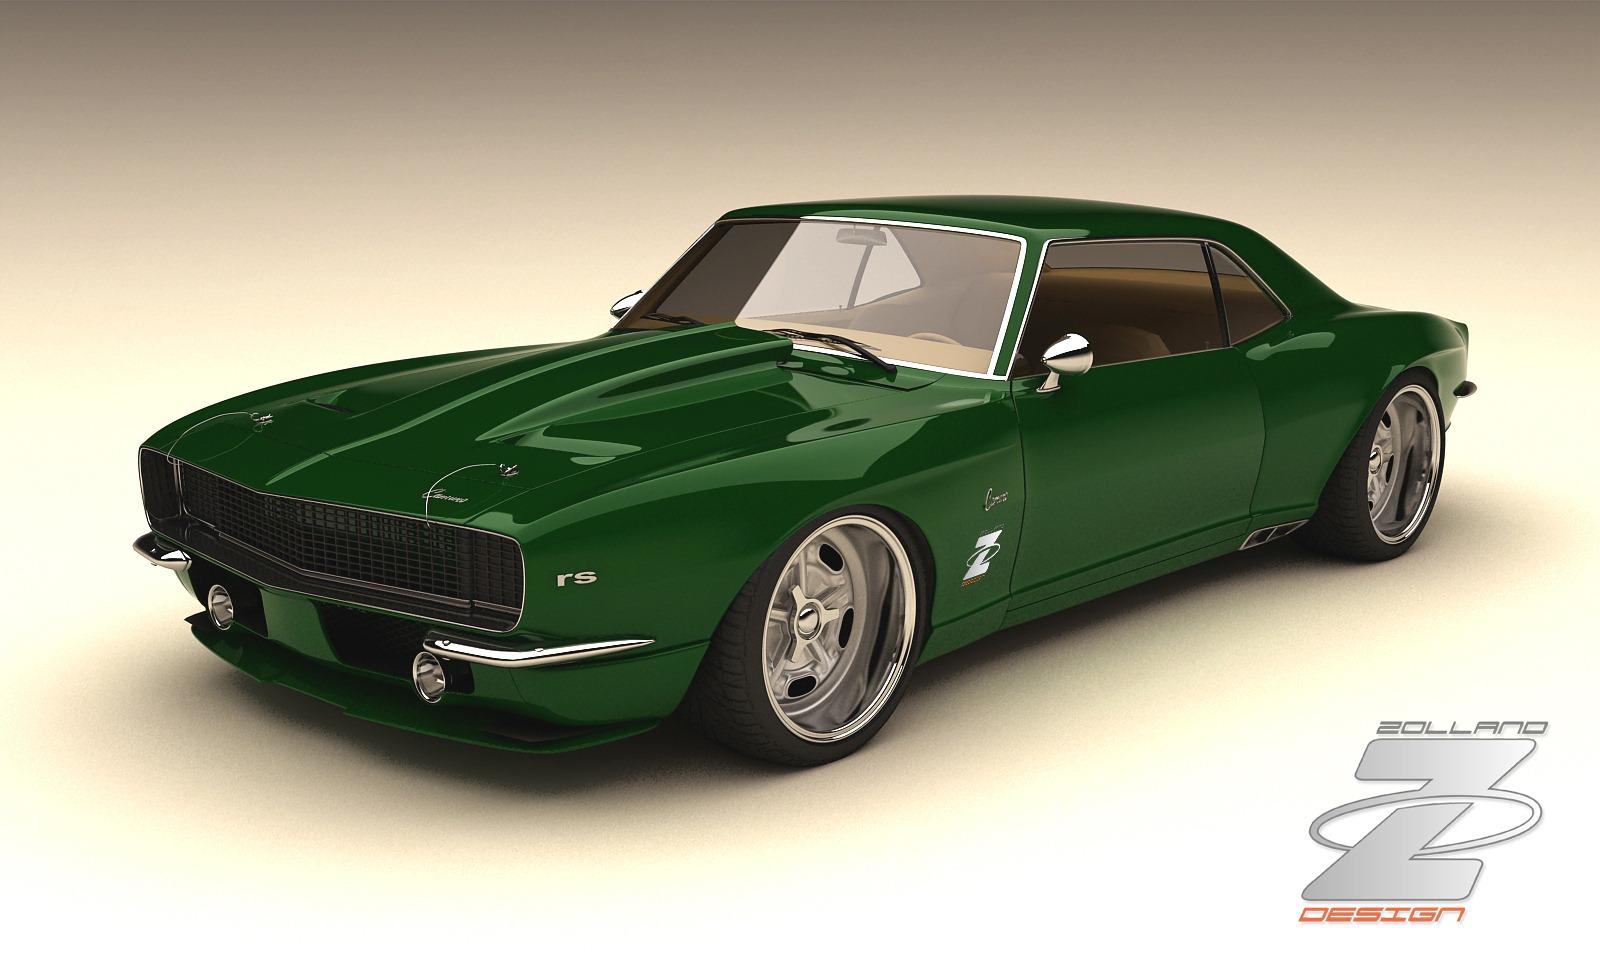 Index of /img/bo-zolland/2010-Classic-Mustang-Fastback-Vizualtech